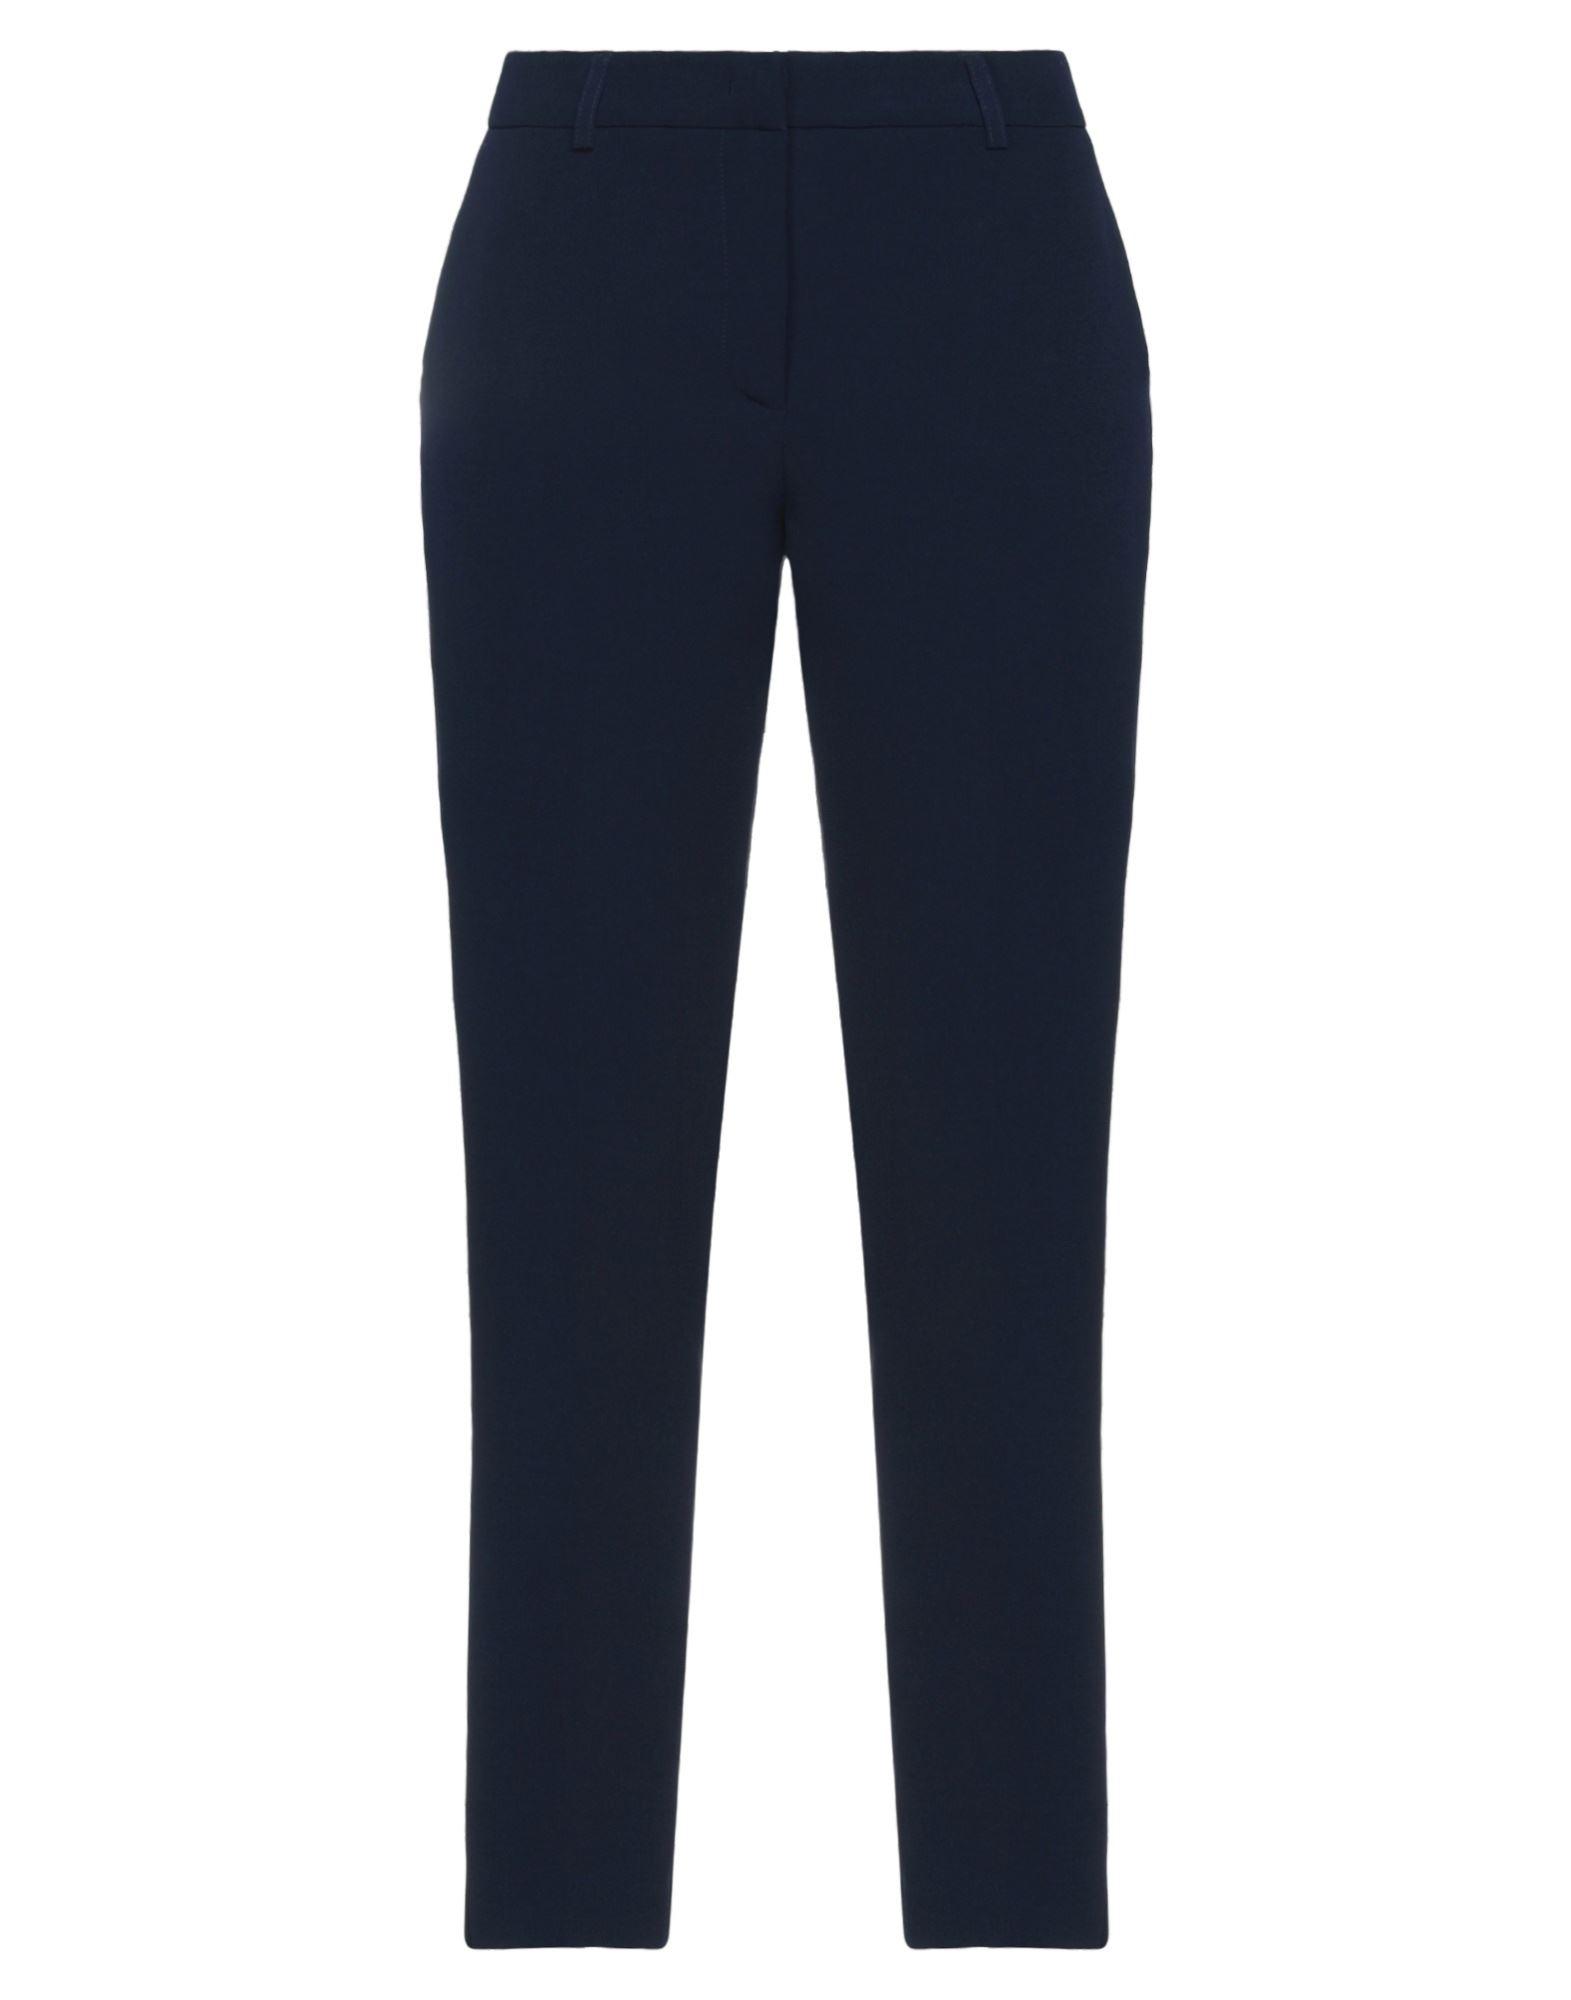 TRUSSARDI JEANS Повседневные брюки flare jeans повседневные брюки